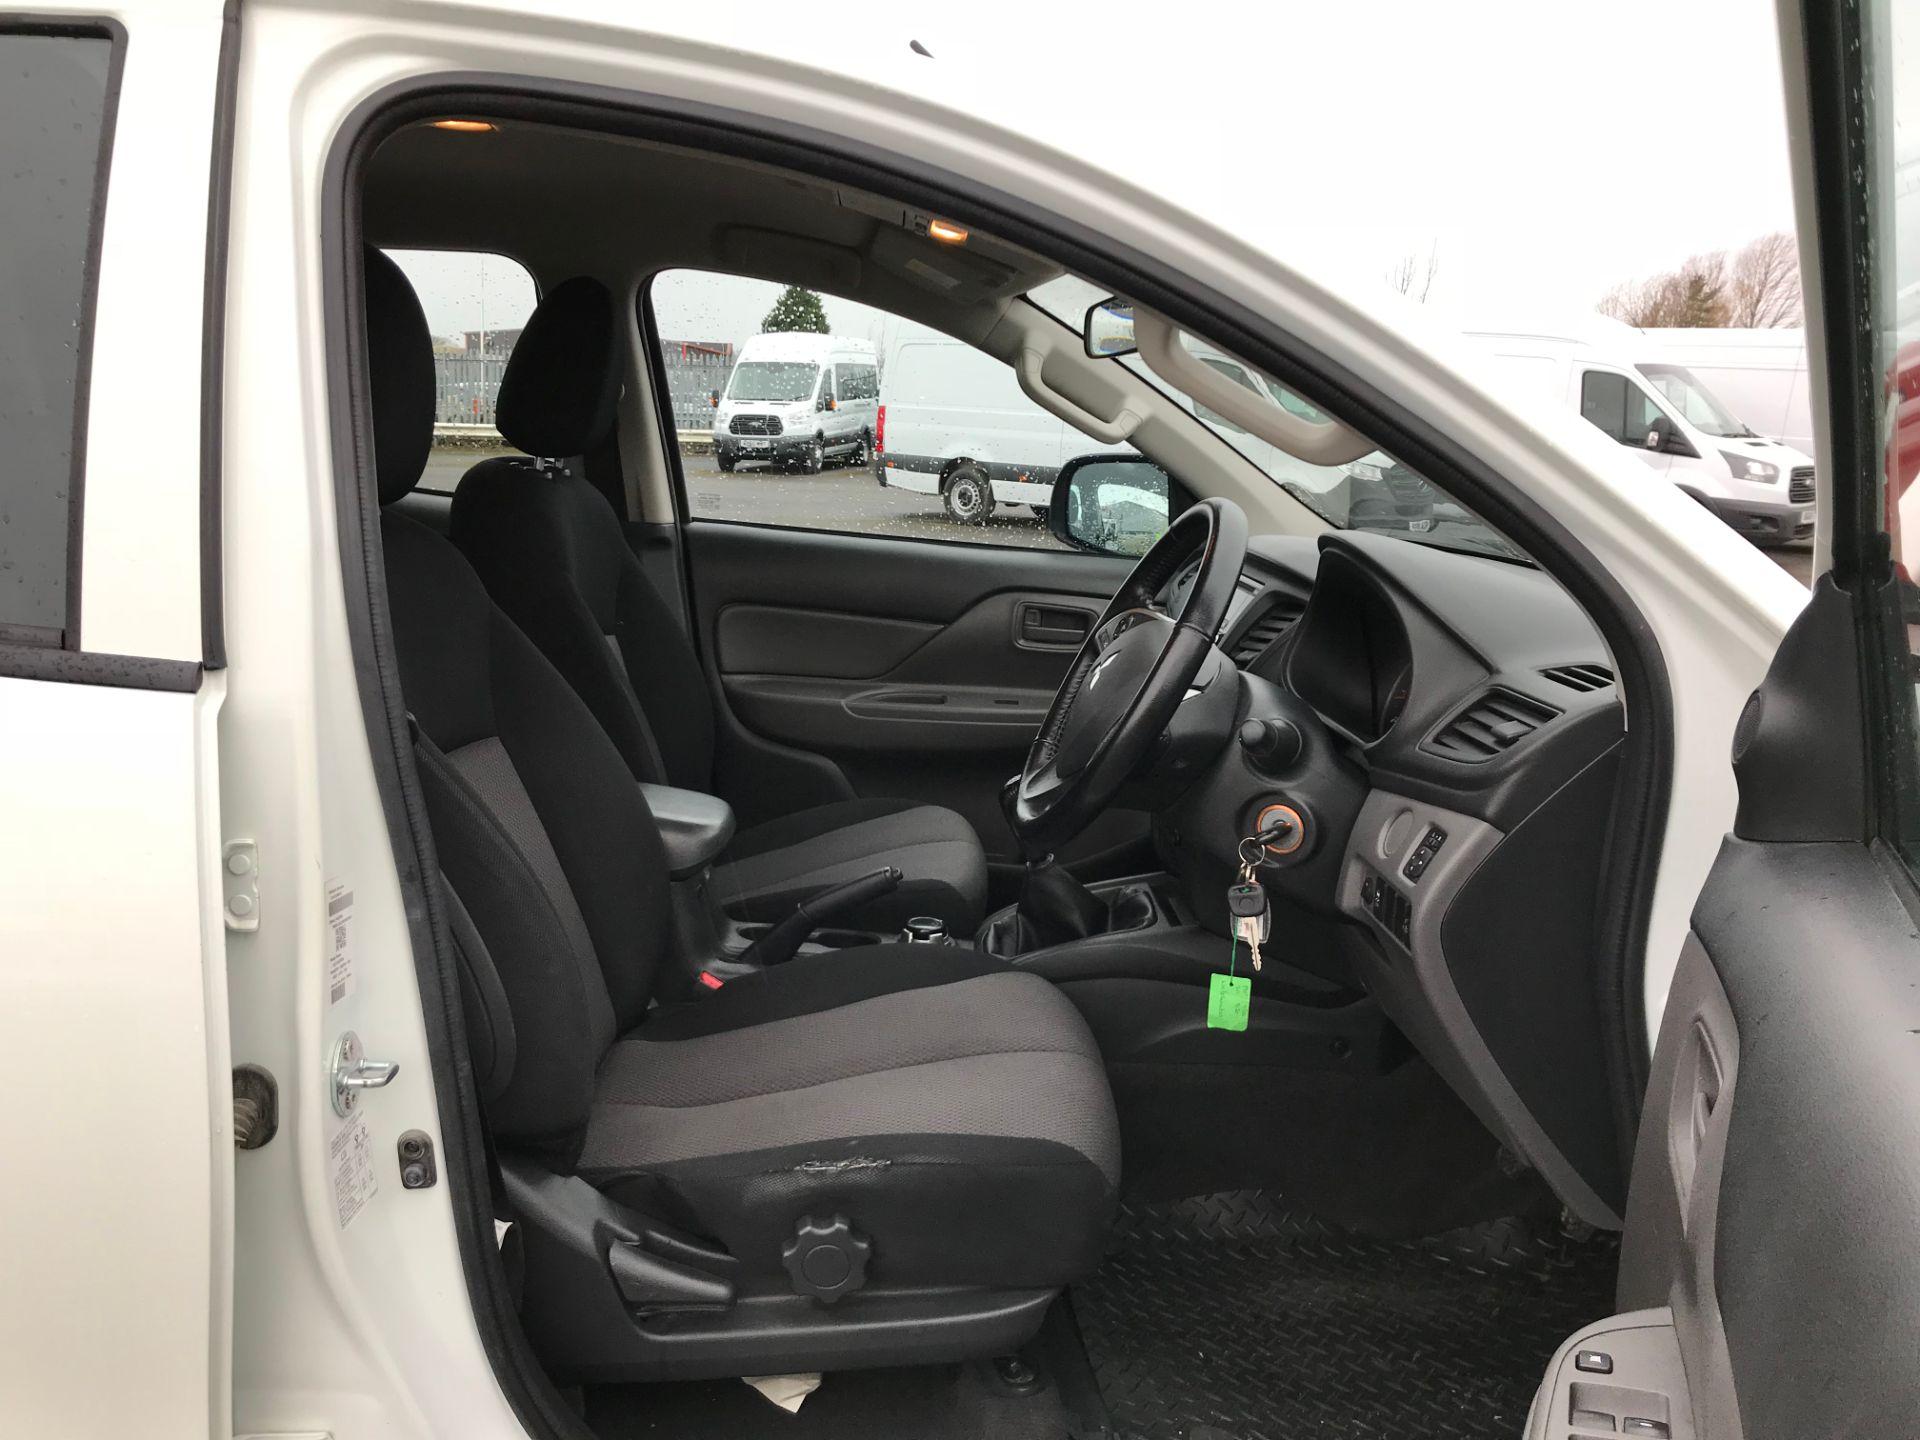 2016 Mitsubishi L200 Double Cab Di-D 151 4Life 4Wd (DV66VPT) Image 11